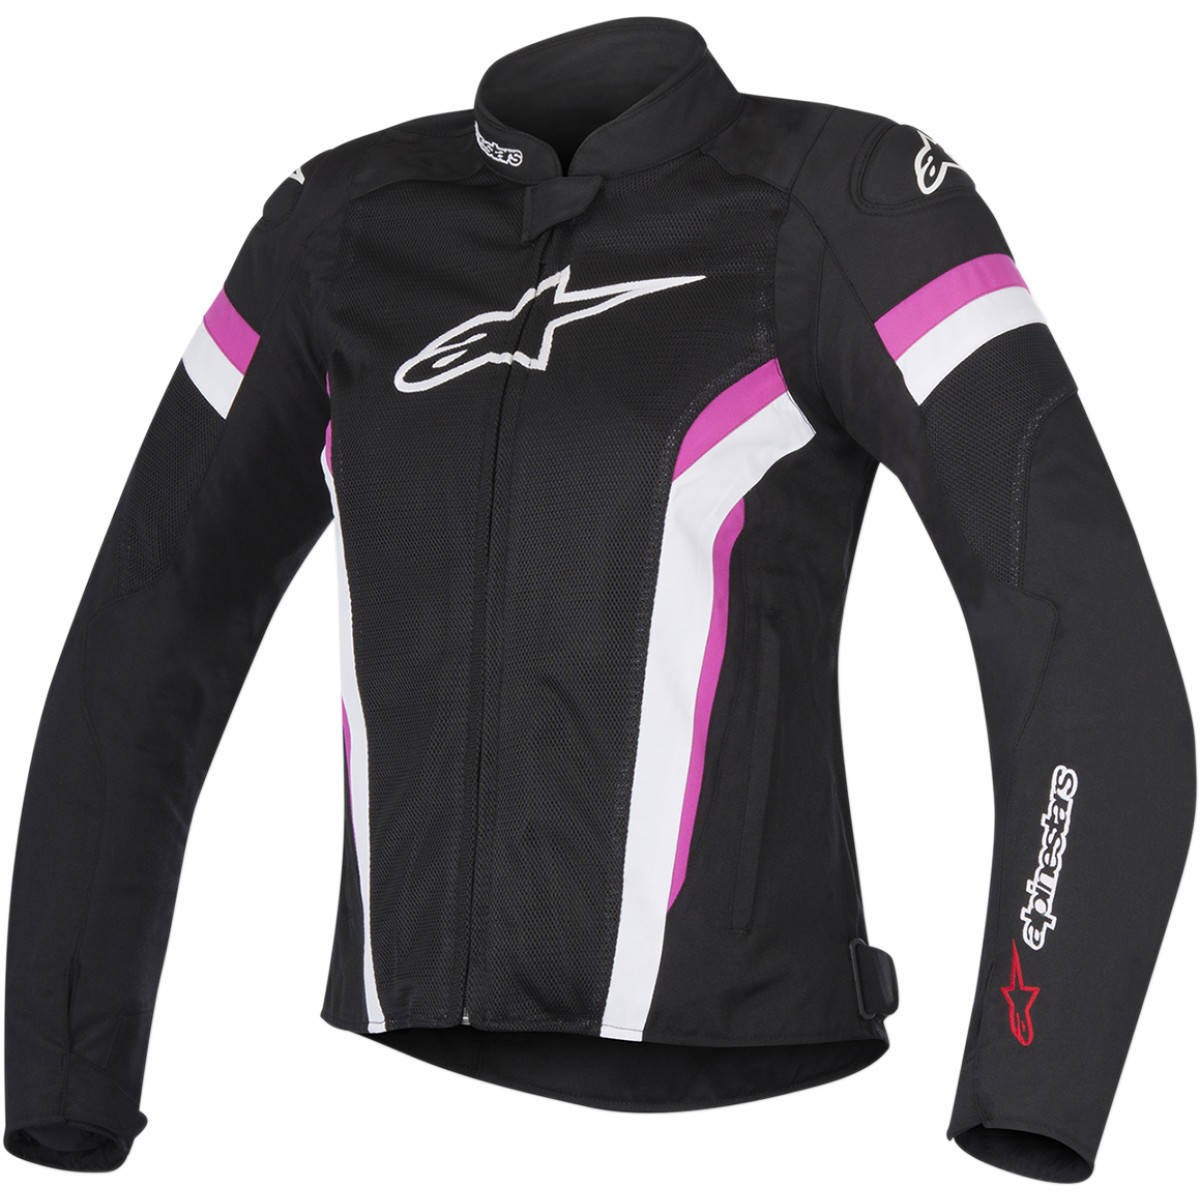 Jaqueta Alpinestars Stella T-GP Plus R Air V2 Preta/Rosa/ Branca  - Planet Bike Shop Moto Acessórios